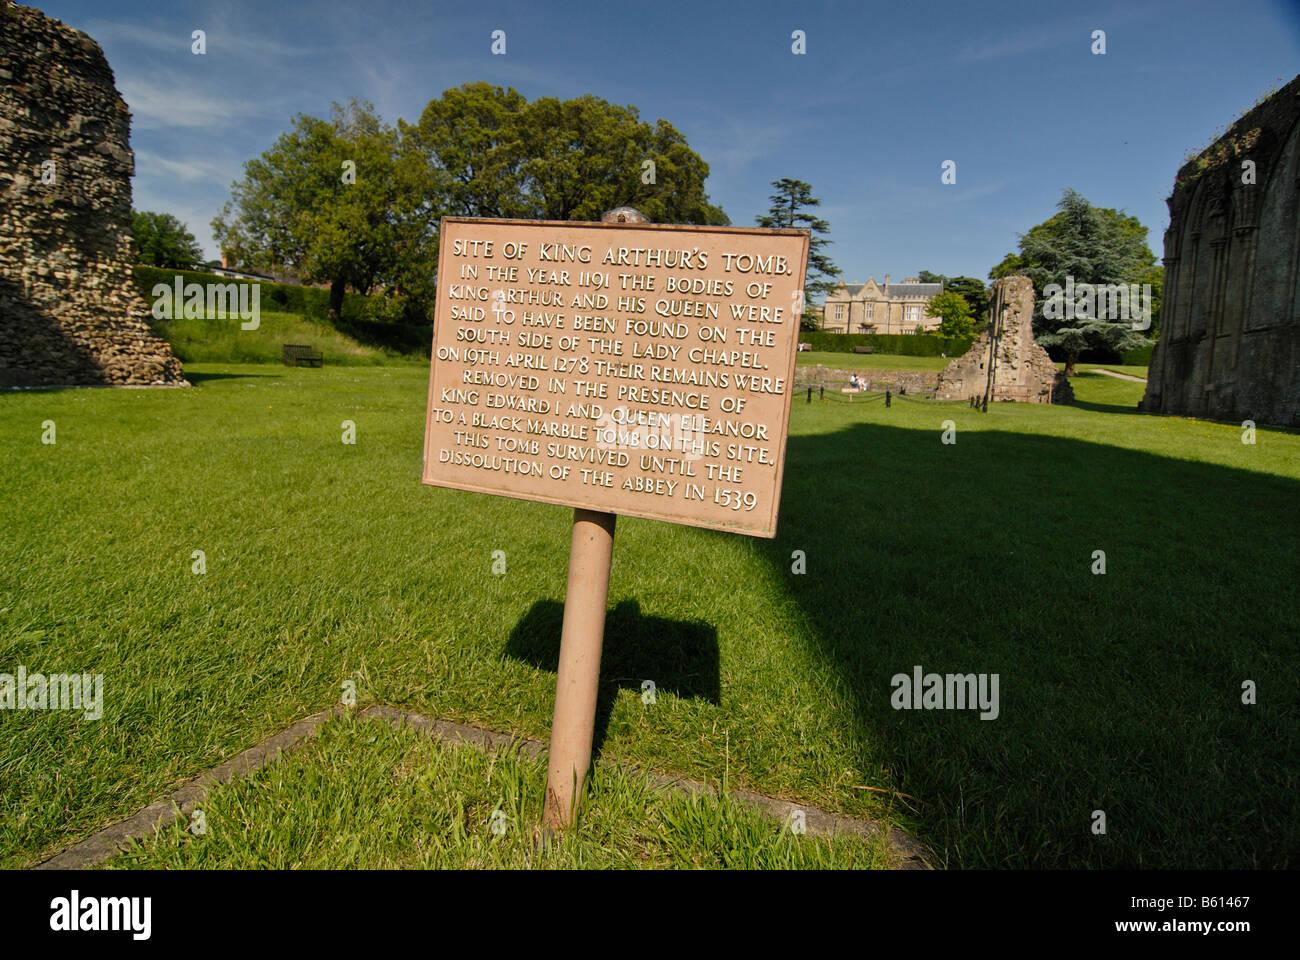 Sign for King Arthur's Tomb, Glastonbury Abbey, Ley lines, Legend of King Arthur, Glastonbury, Mendip, Somerset, - Stock Image